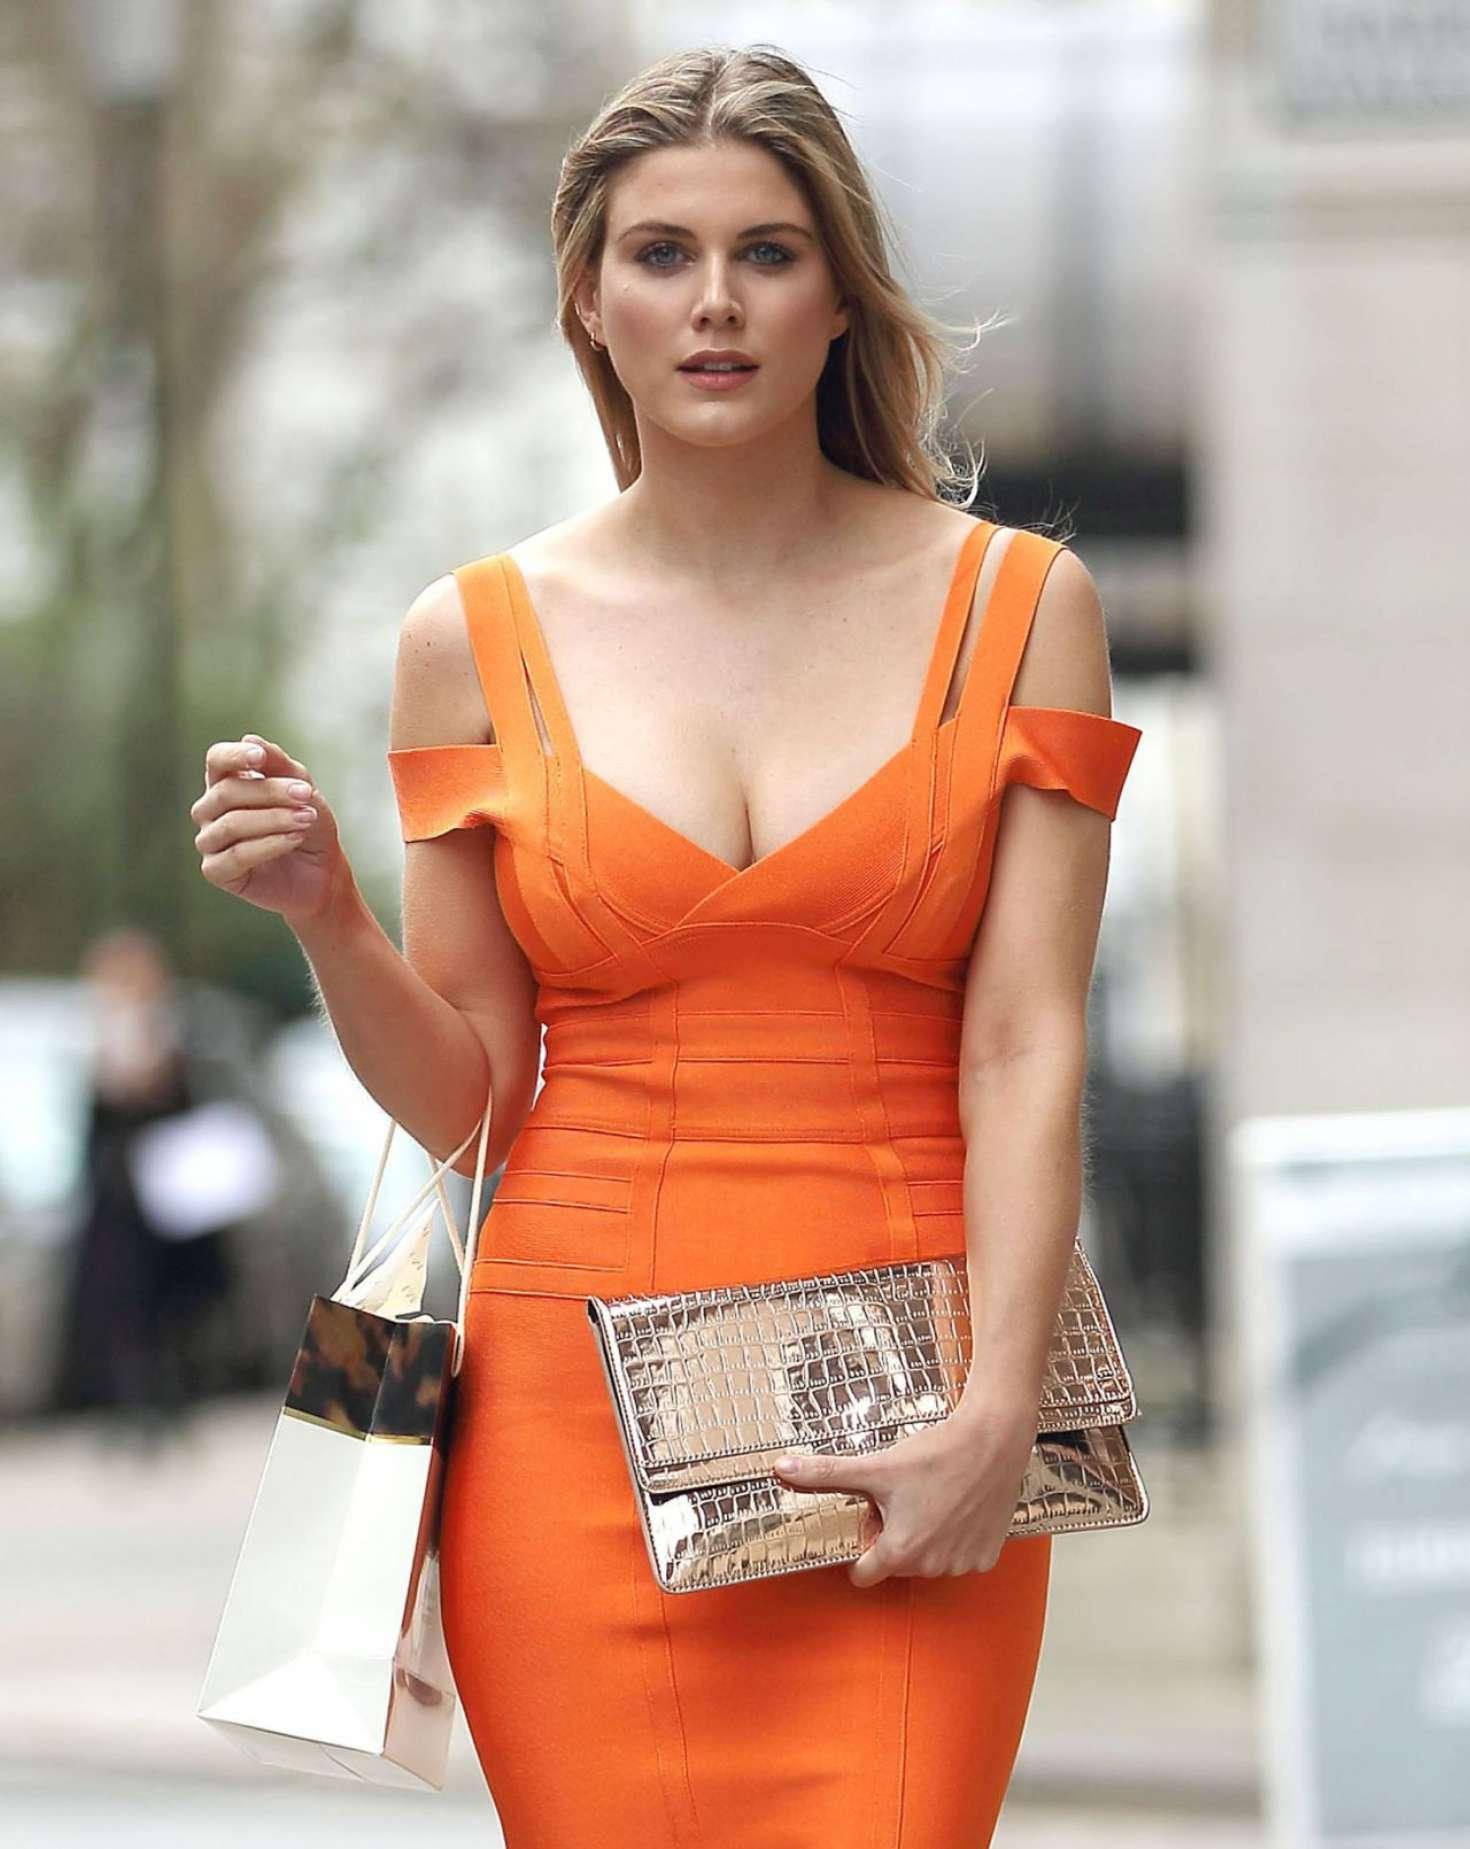 Ashley James Leaving Harvey Nichols 02 Danielle Bregoli